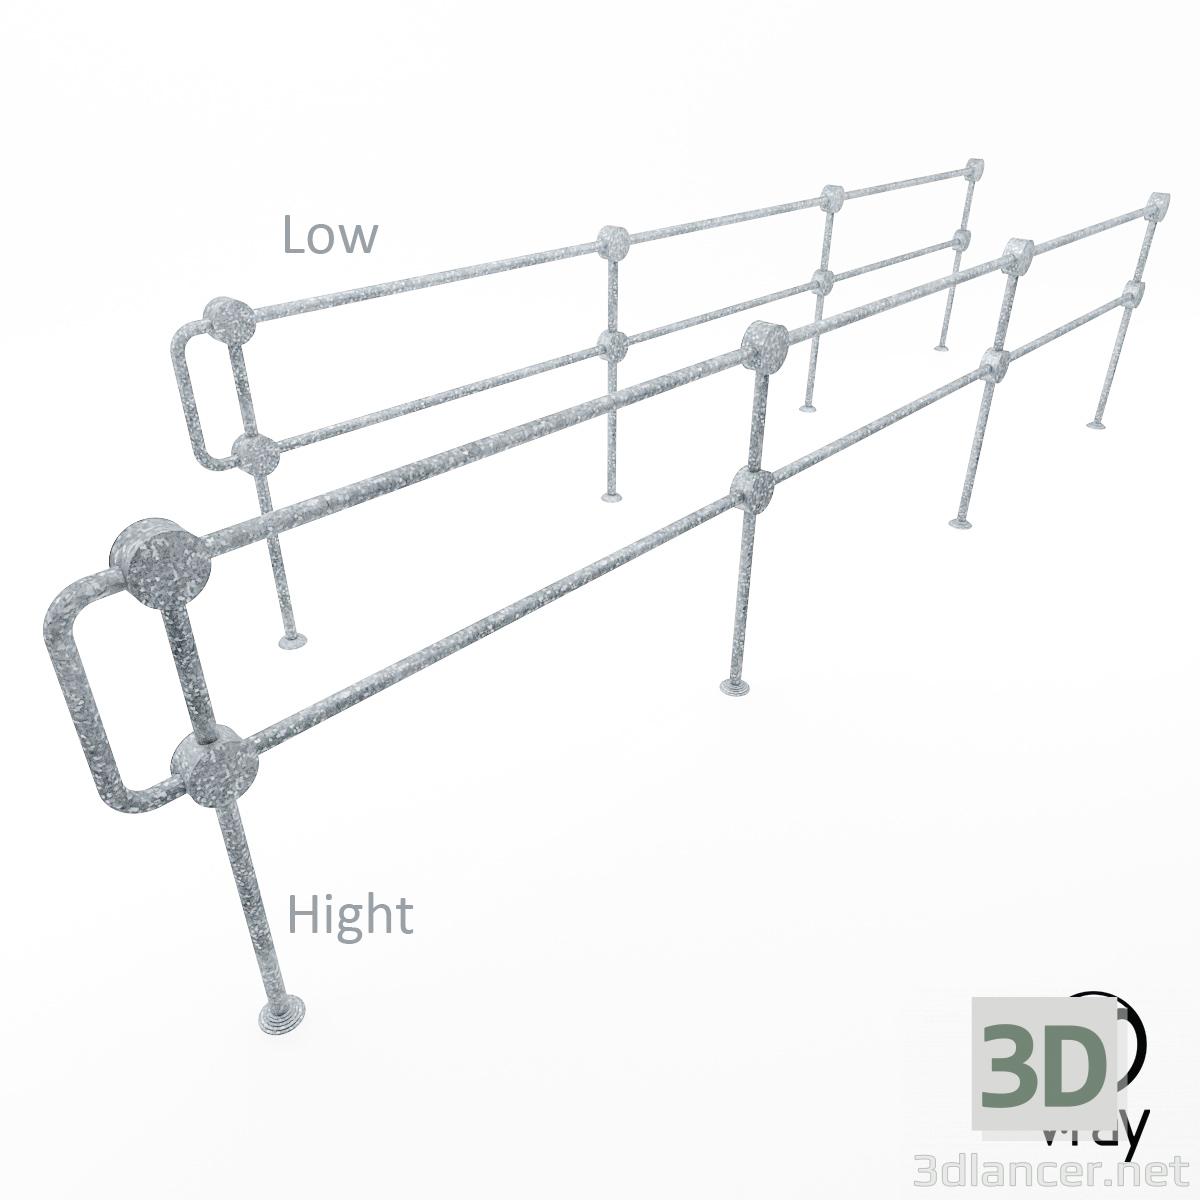 Modelo 3D de PREVIEWNUM